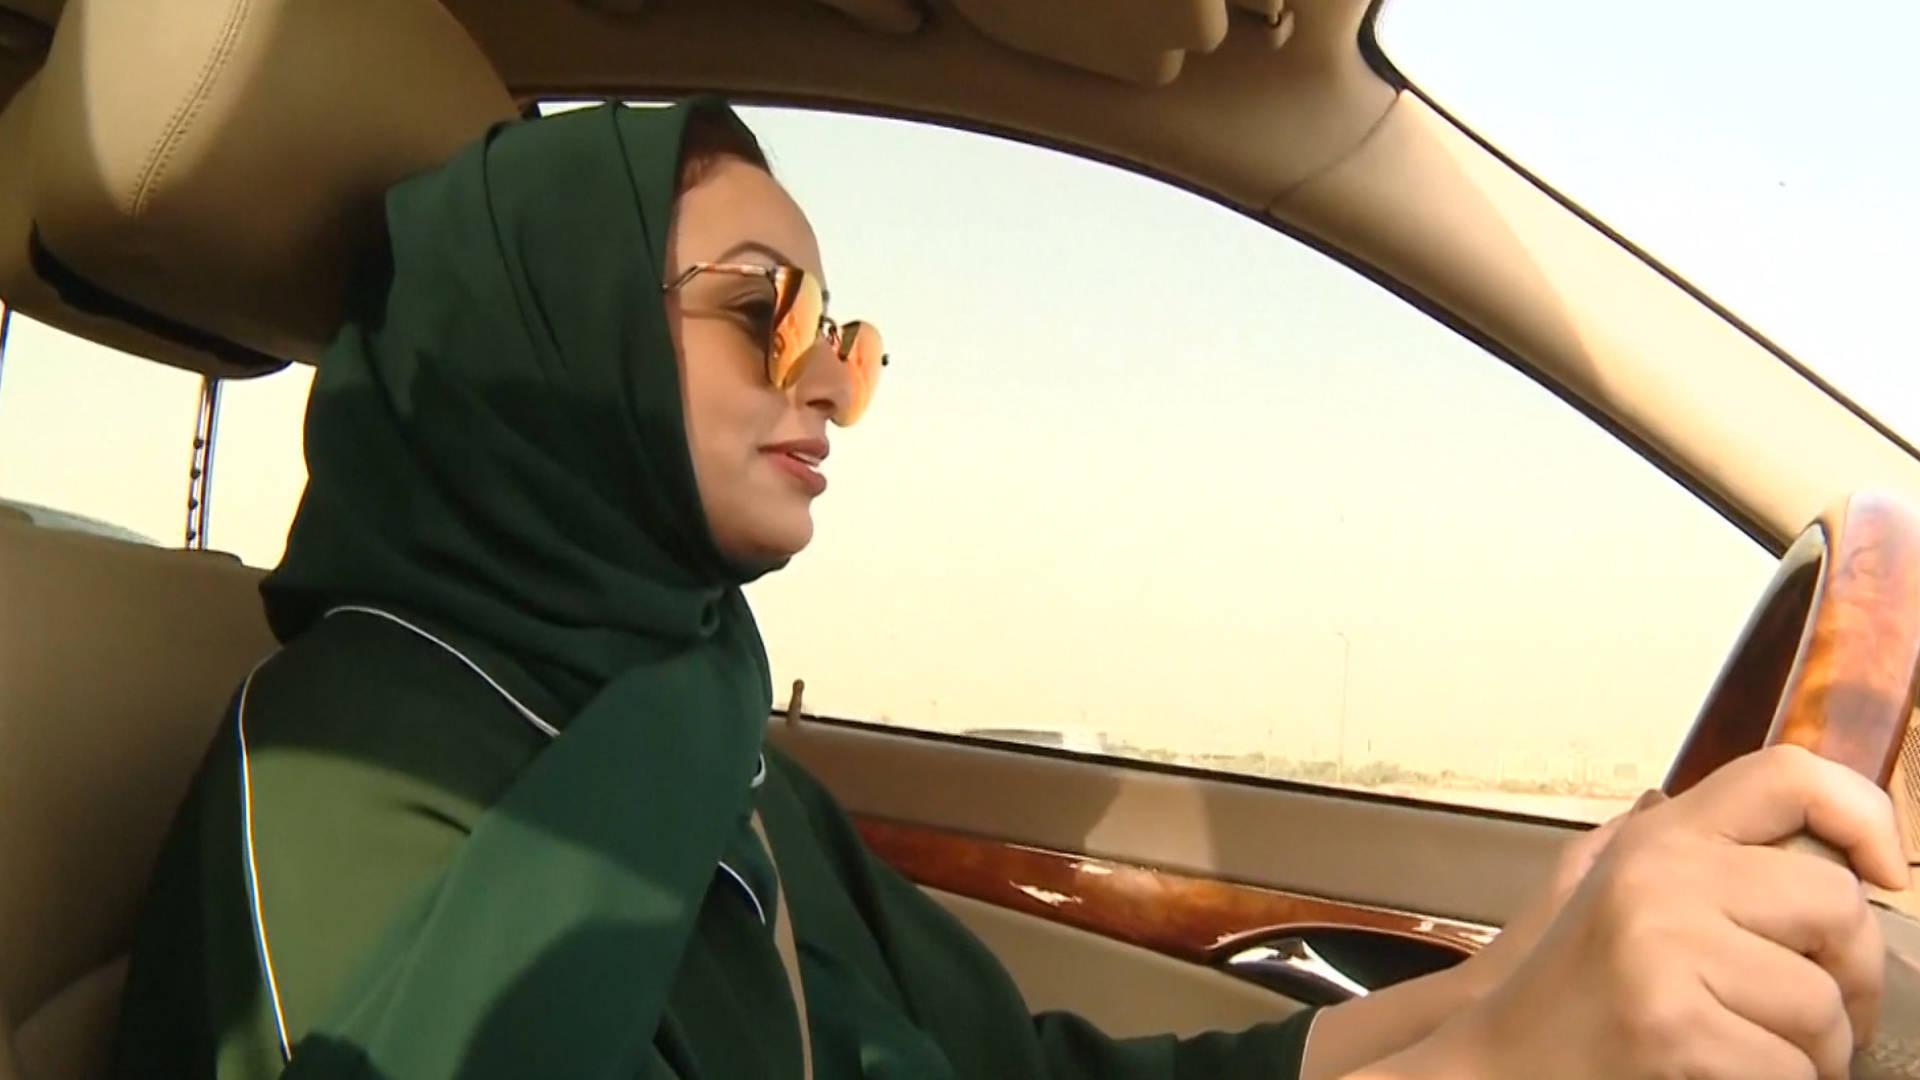 A History of Crushing Dissent: Before Khashoggi, Saudis Targeted Feminists Deman...